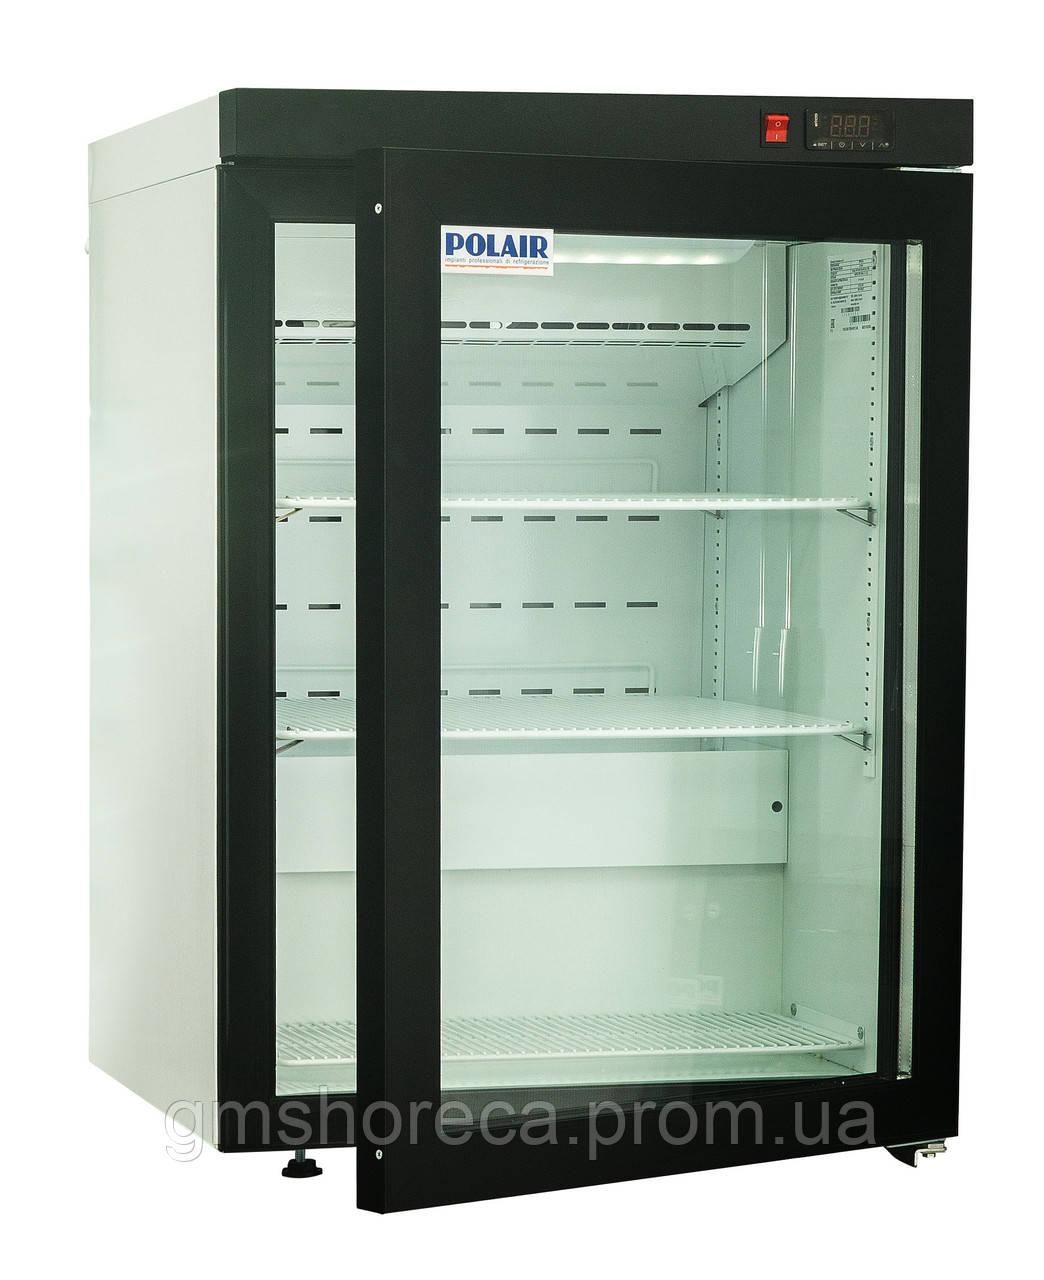 Шкаф холодильный Polair DM-102 Bravo